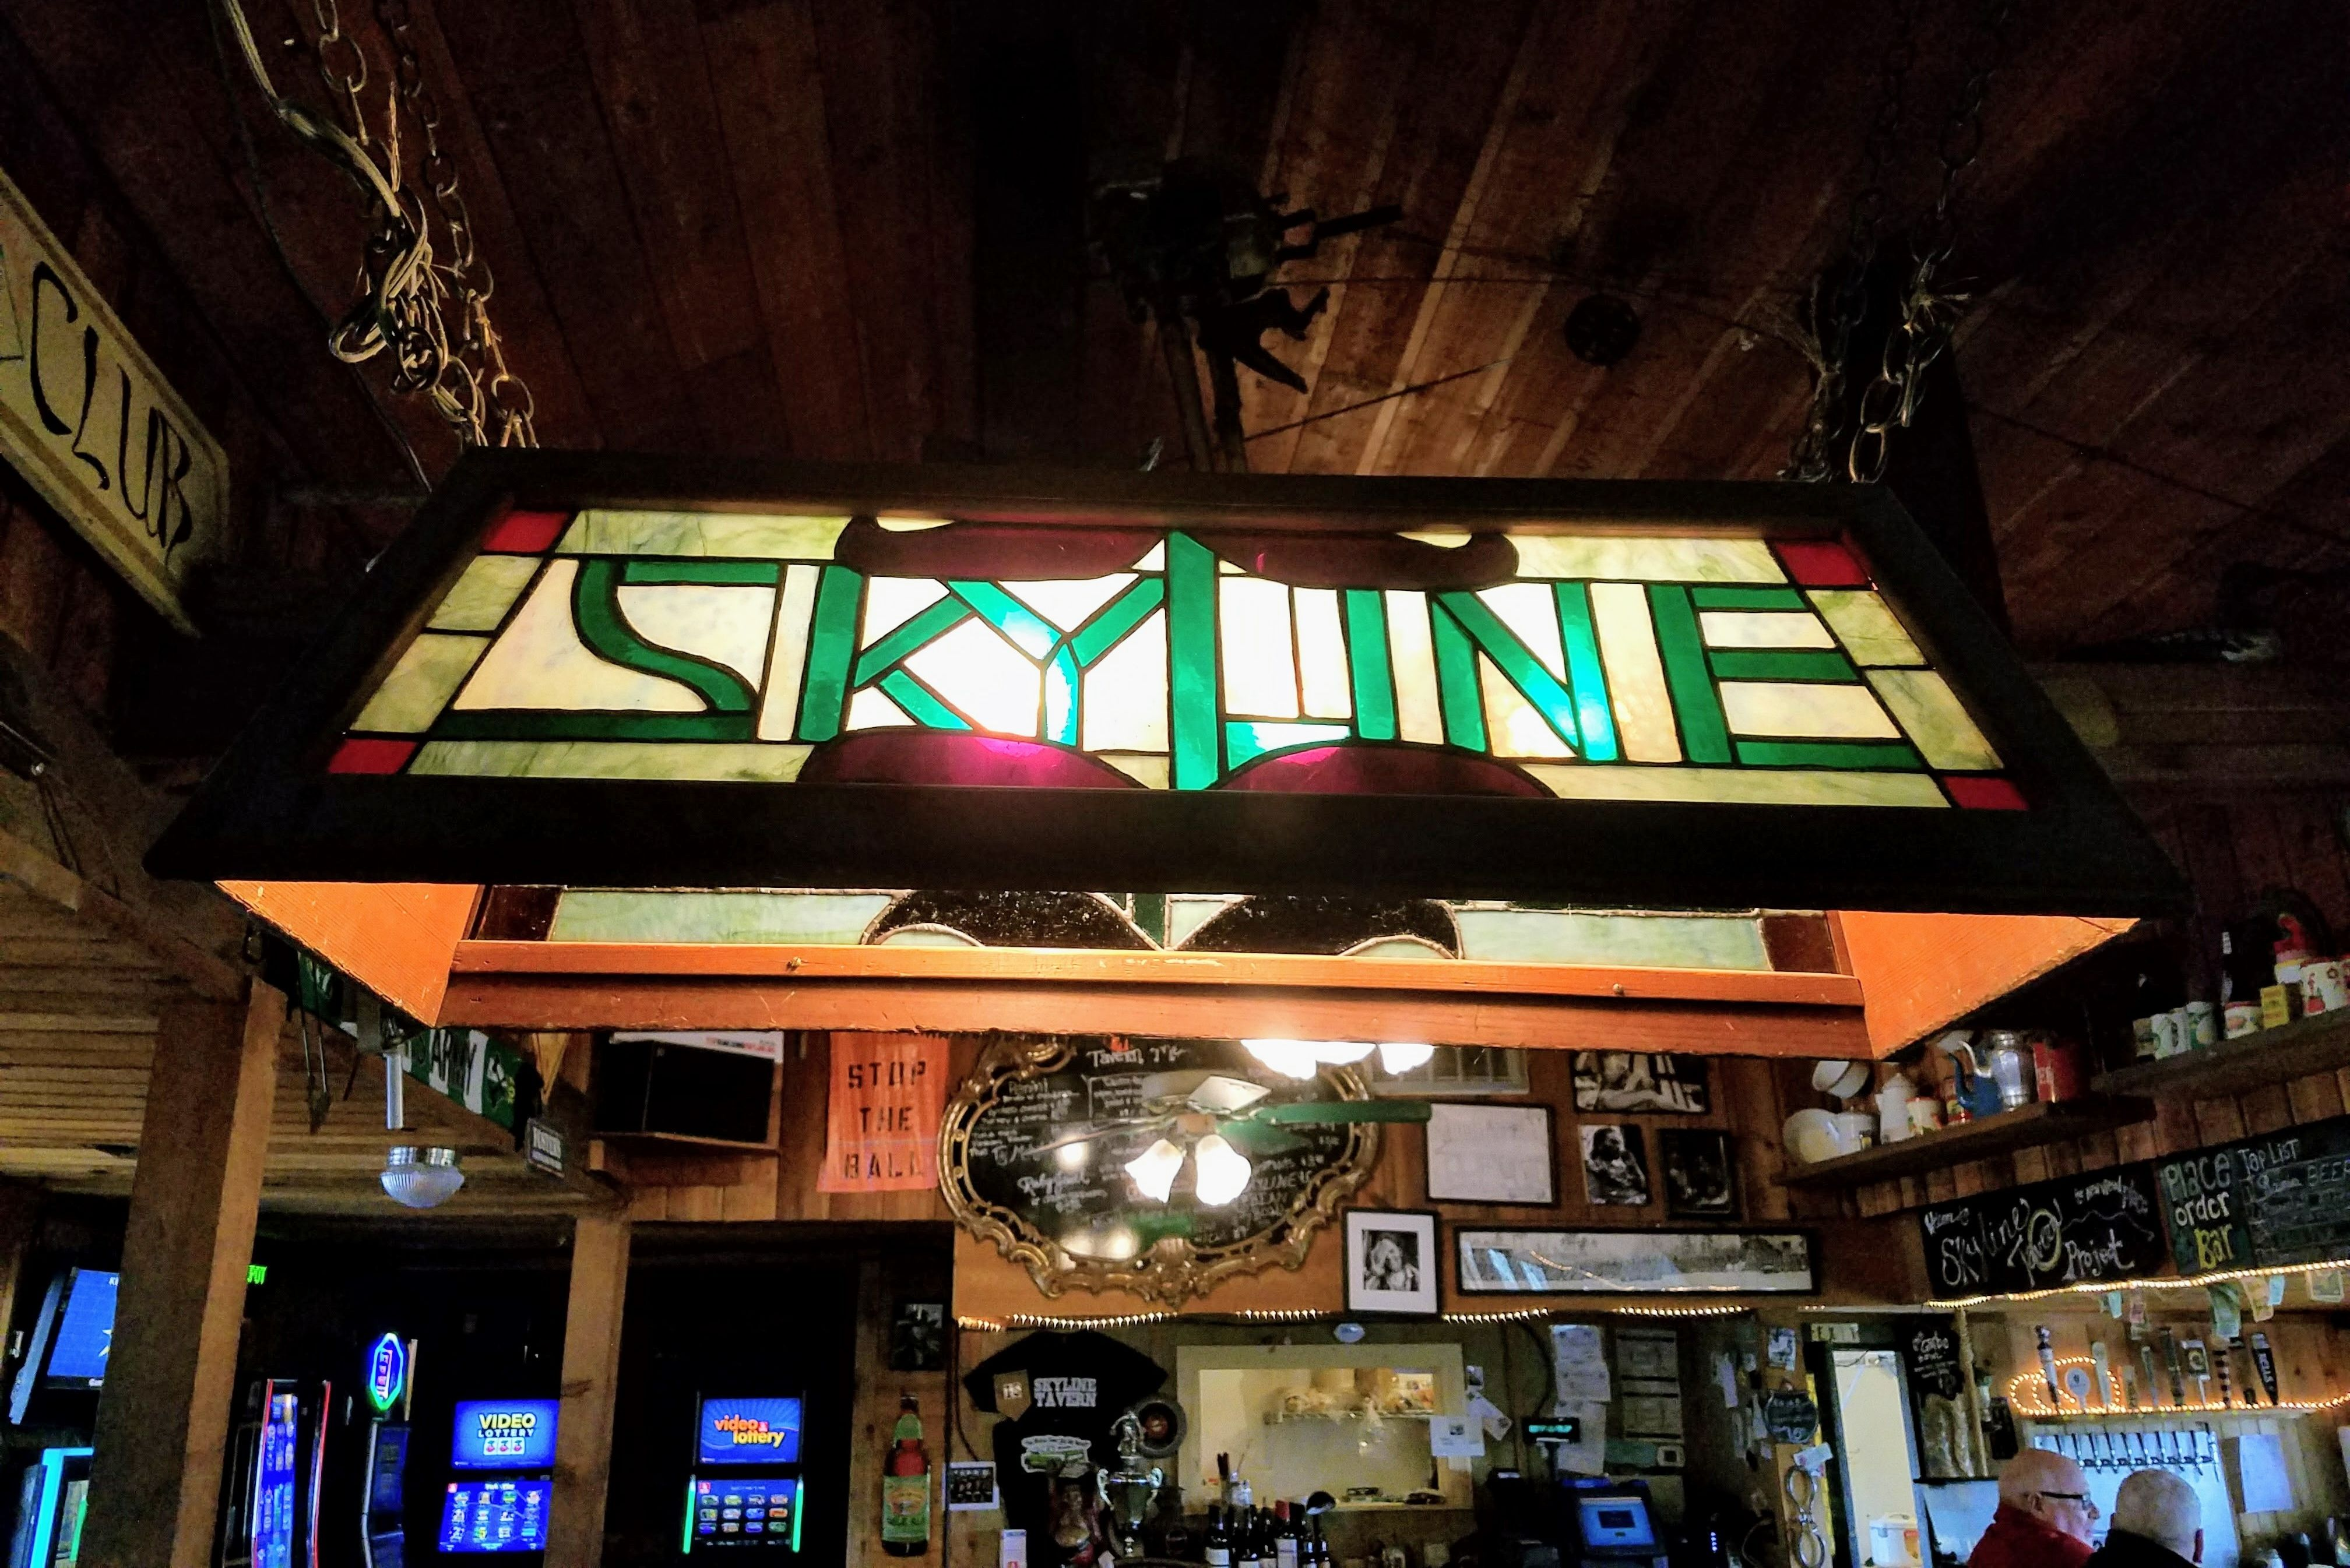 Skyline tavern cdst7o